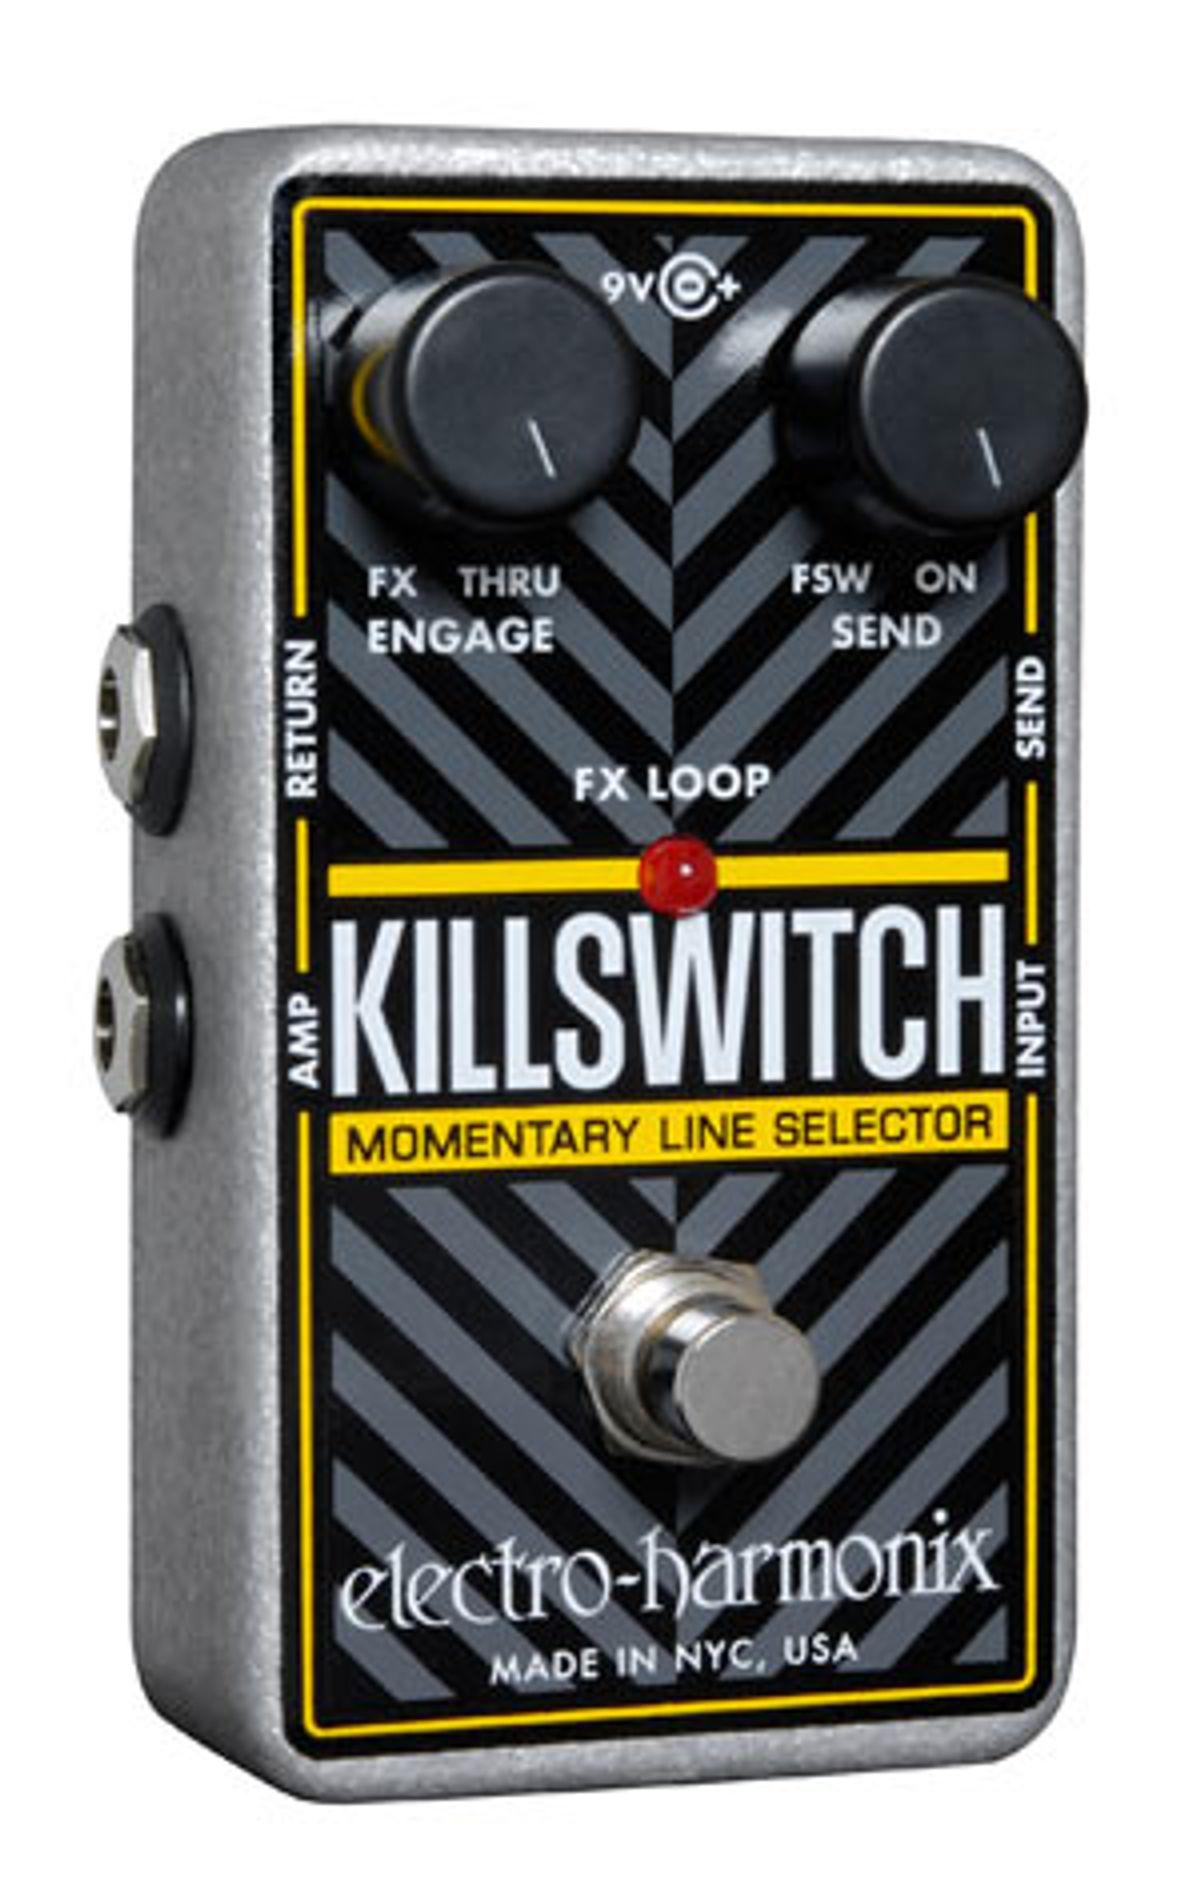 Electro-Harmonix Announces Killswitch Momentary Line Selector